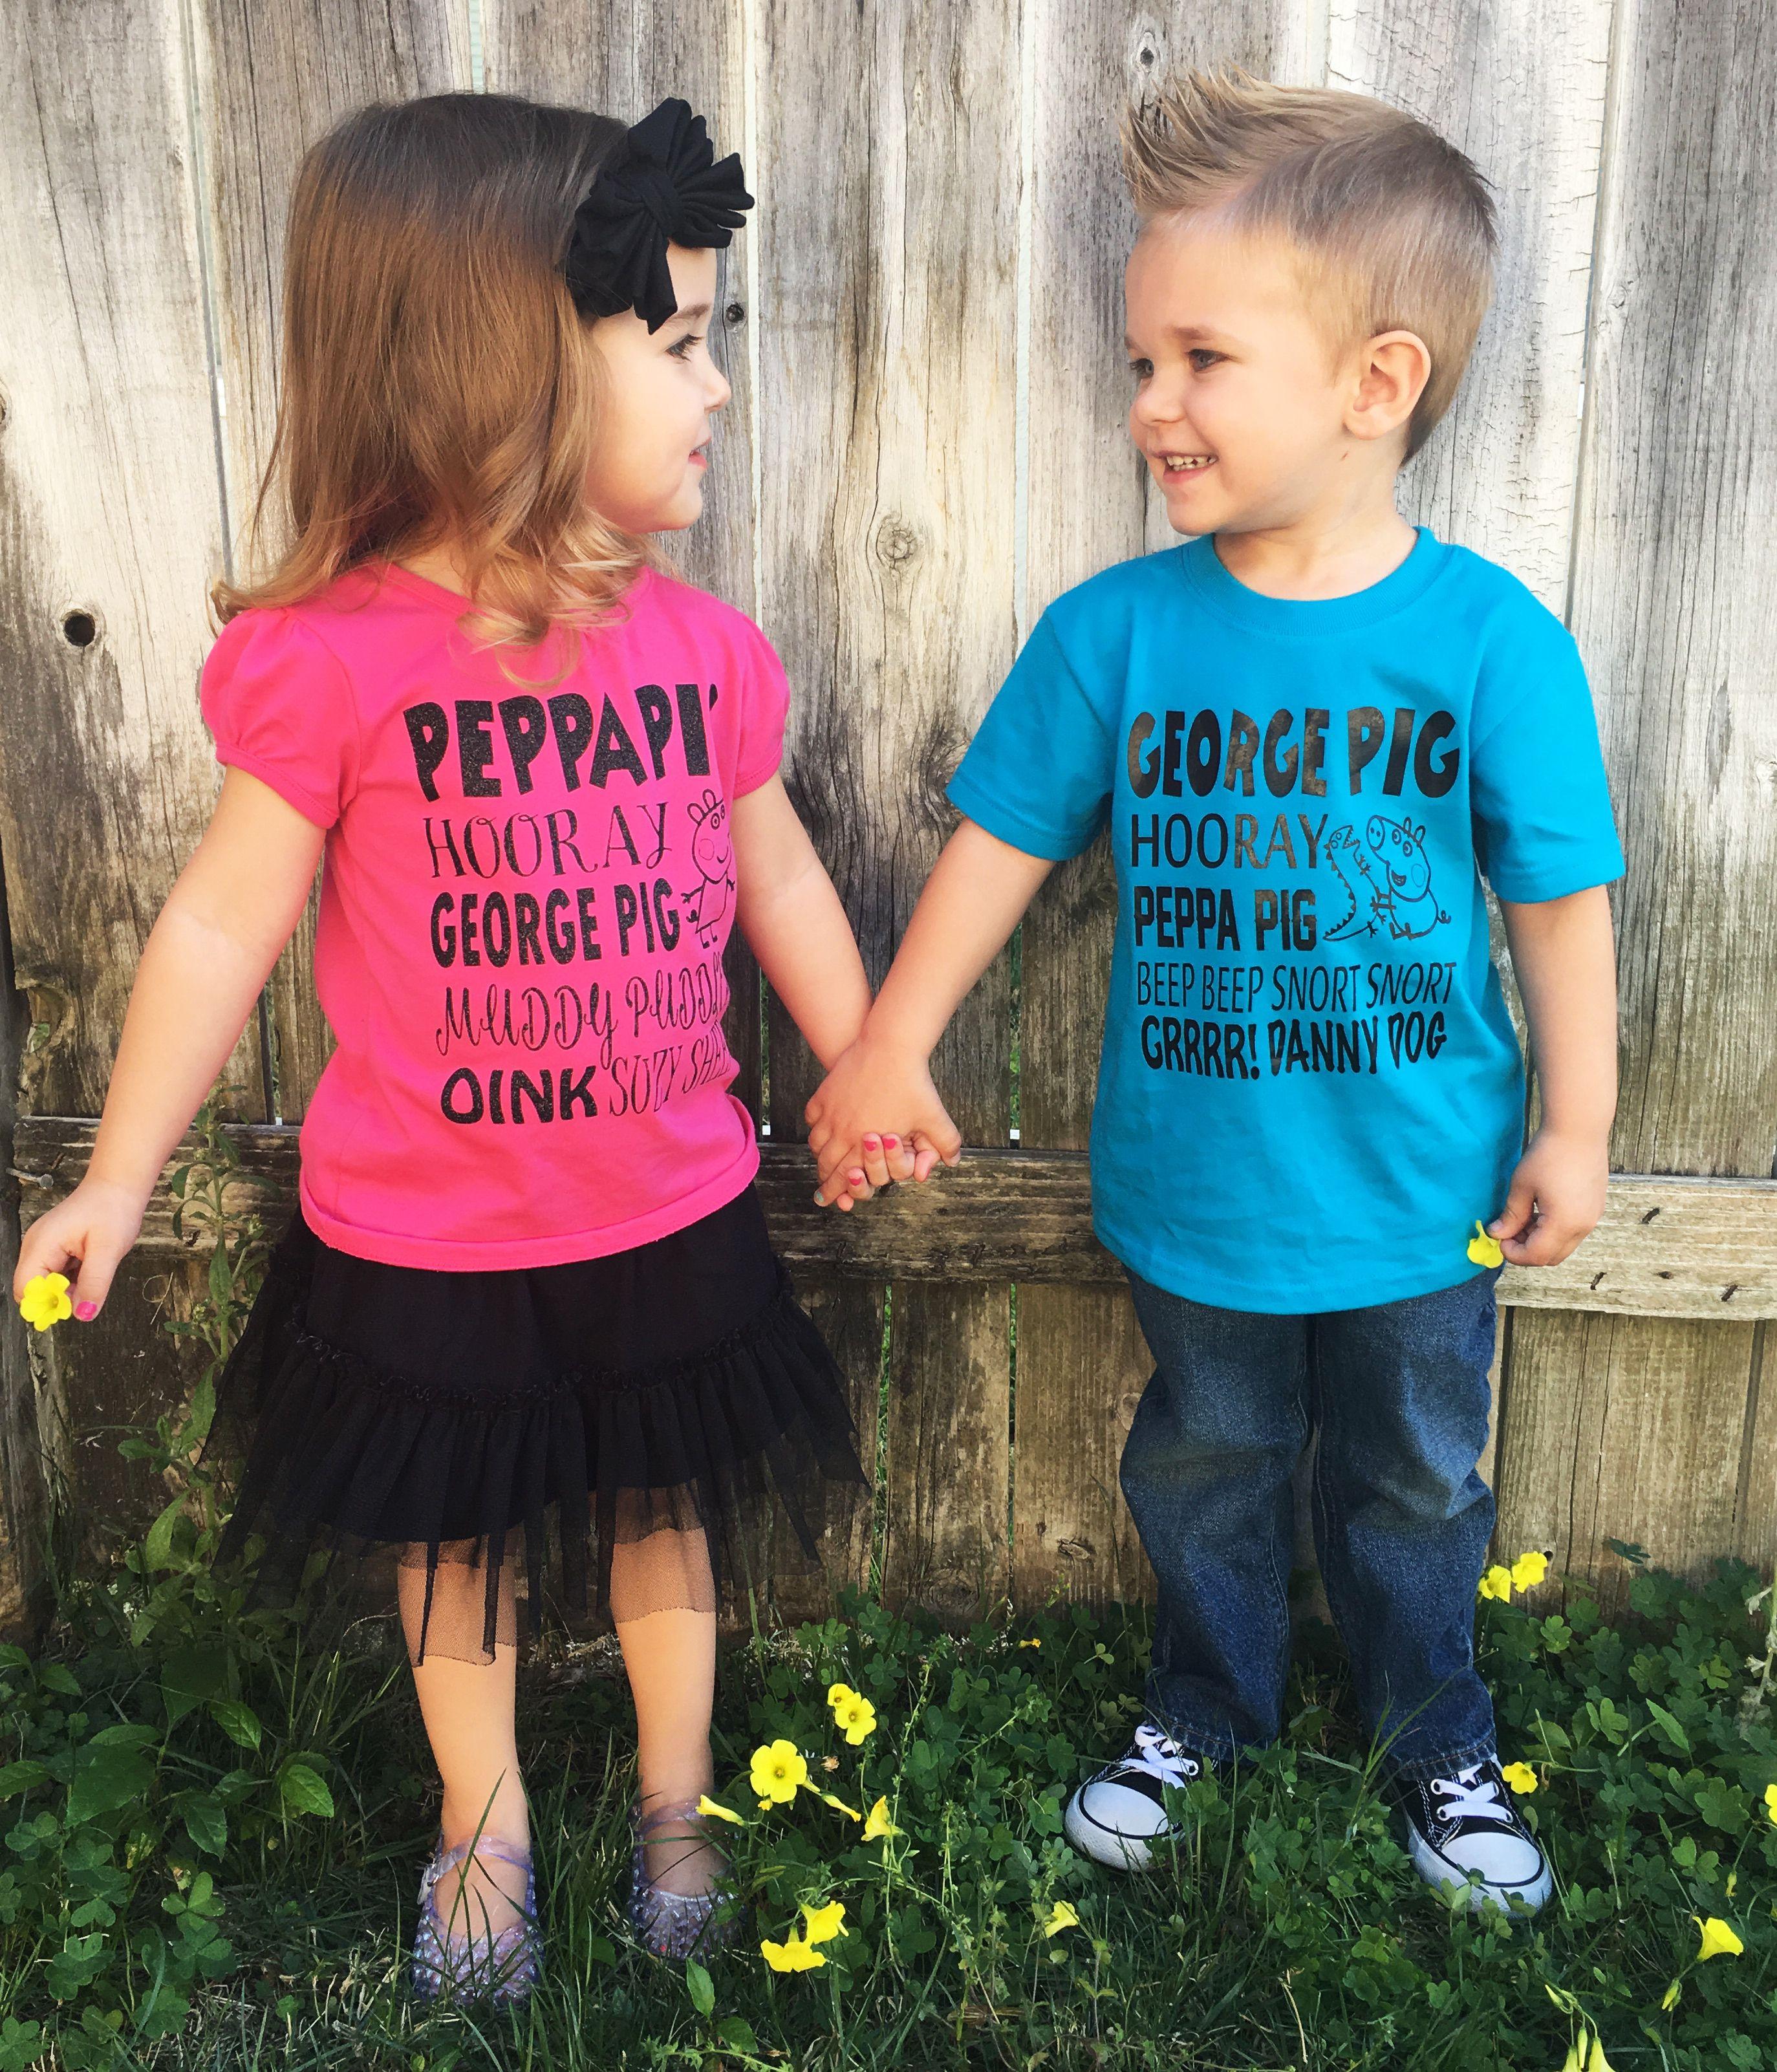 Pin By Jennifer George On Boys Rooms: Peppa Pig Shirts